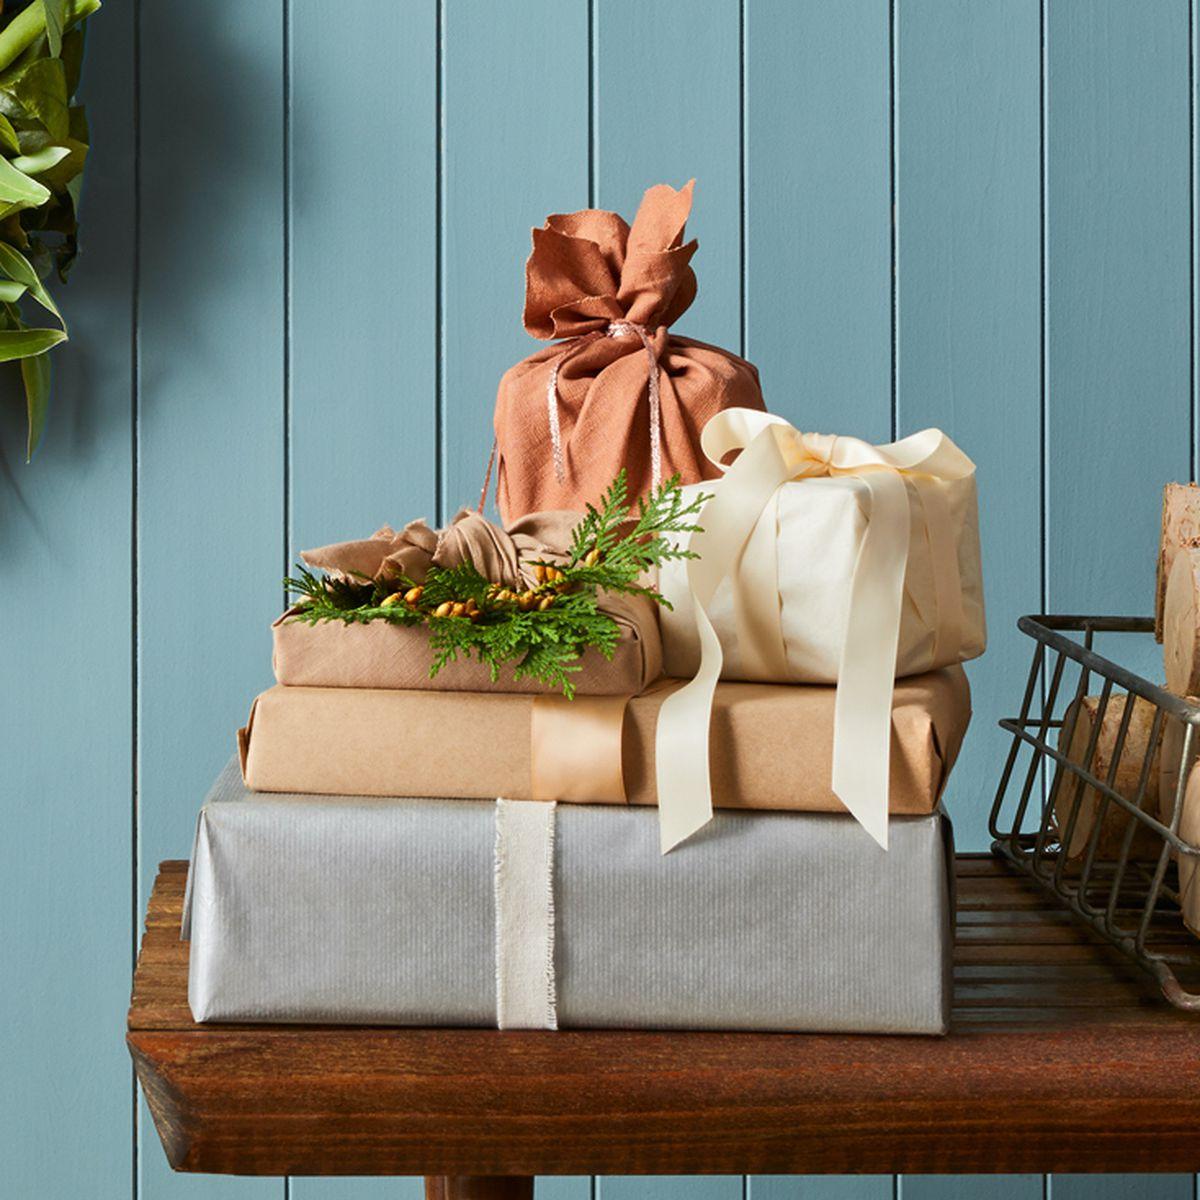 30 Best Gifts Under 30 Cheap Present Ideas 2021